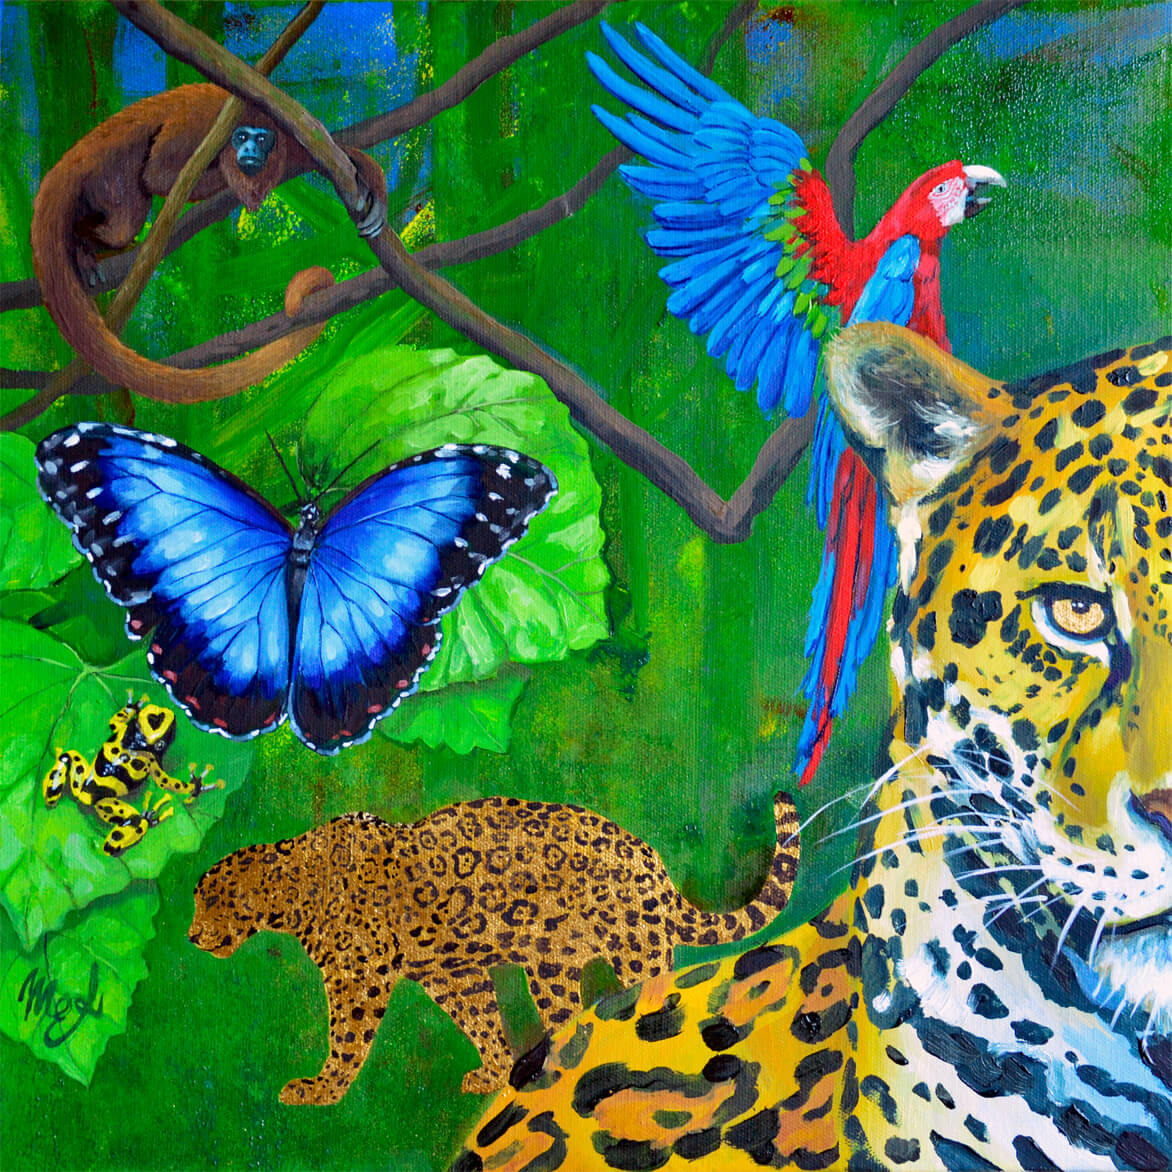 Amazzonia in art